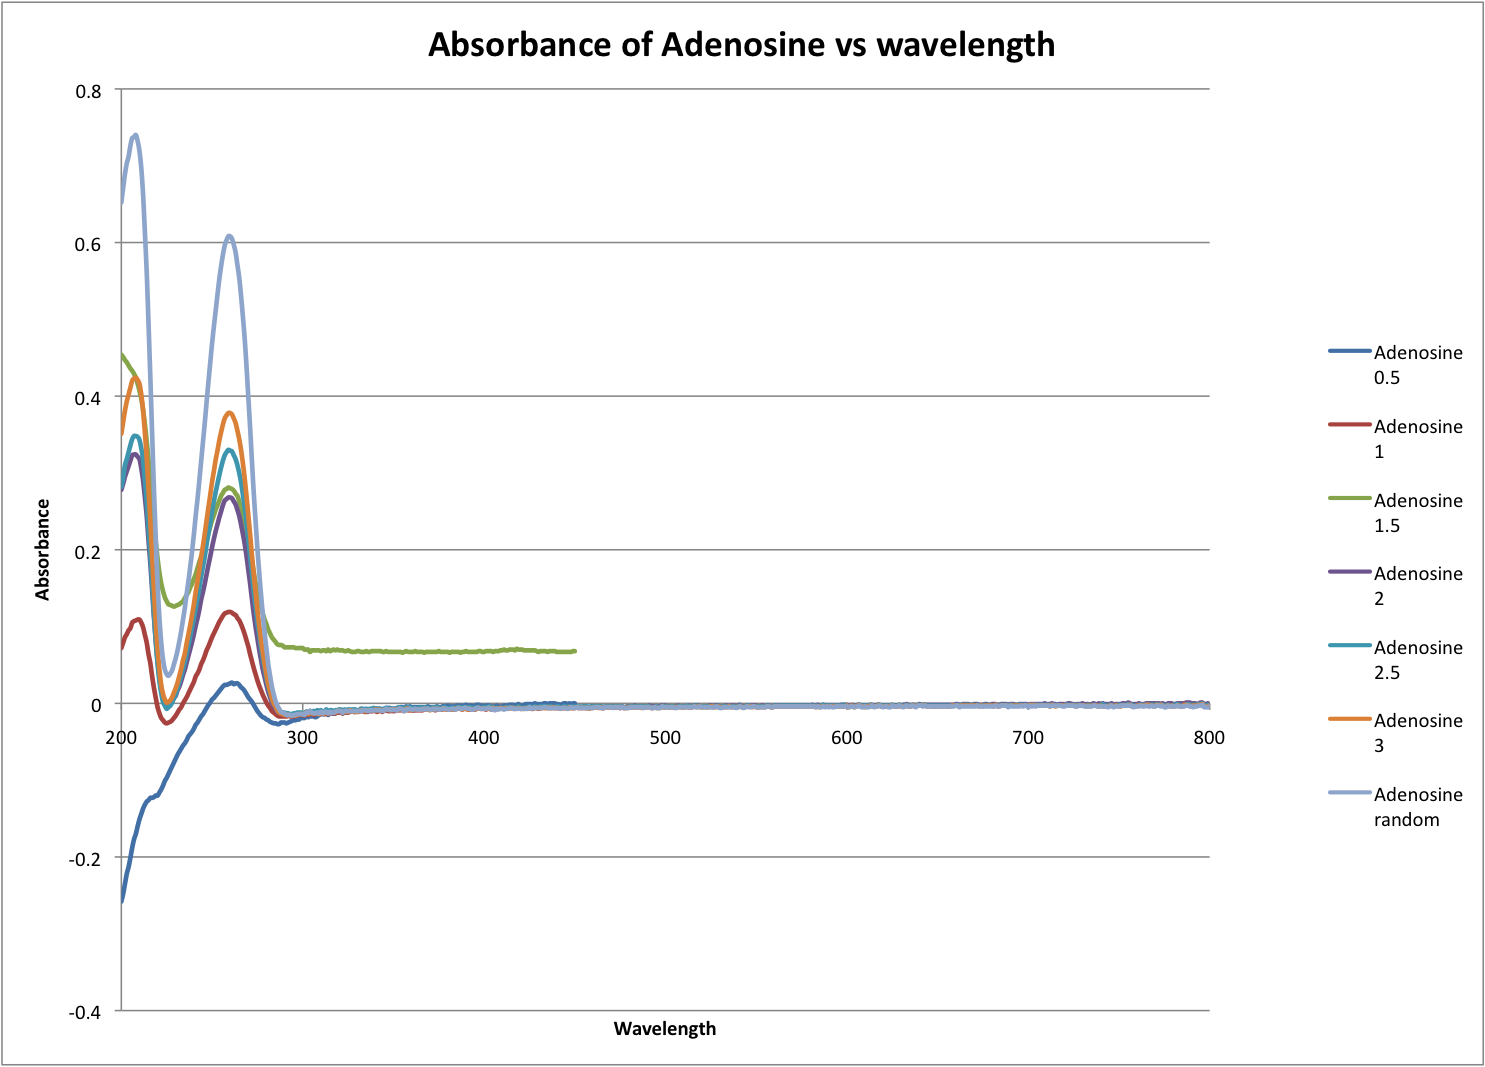 Absorbance of Adenosine vs wavelength.png